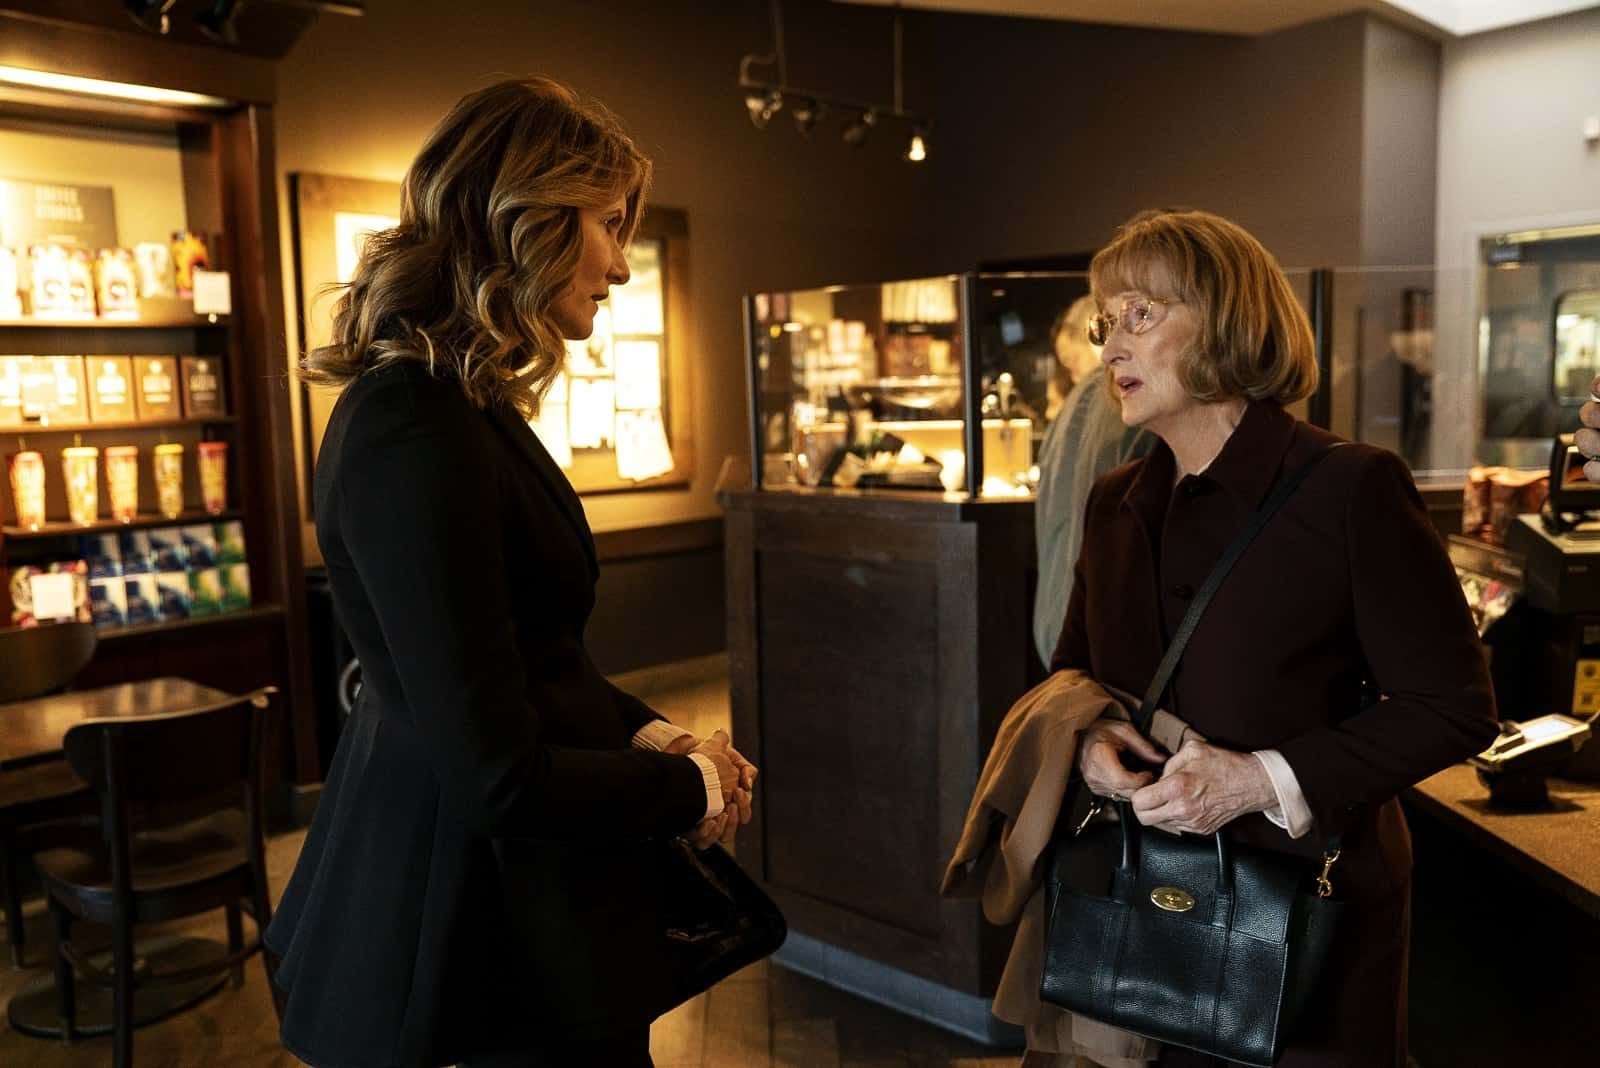 Laura Dern como Renata Klein y Meryl Streep como Mary Louise en Big Little Lies 2.07